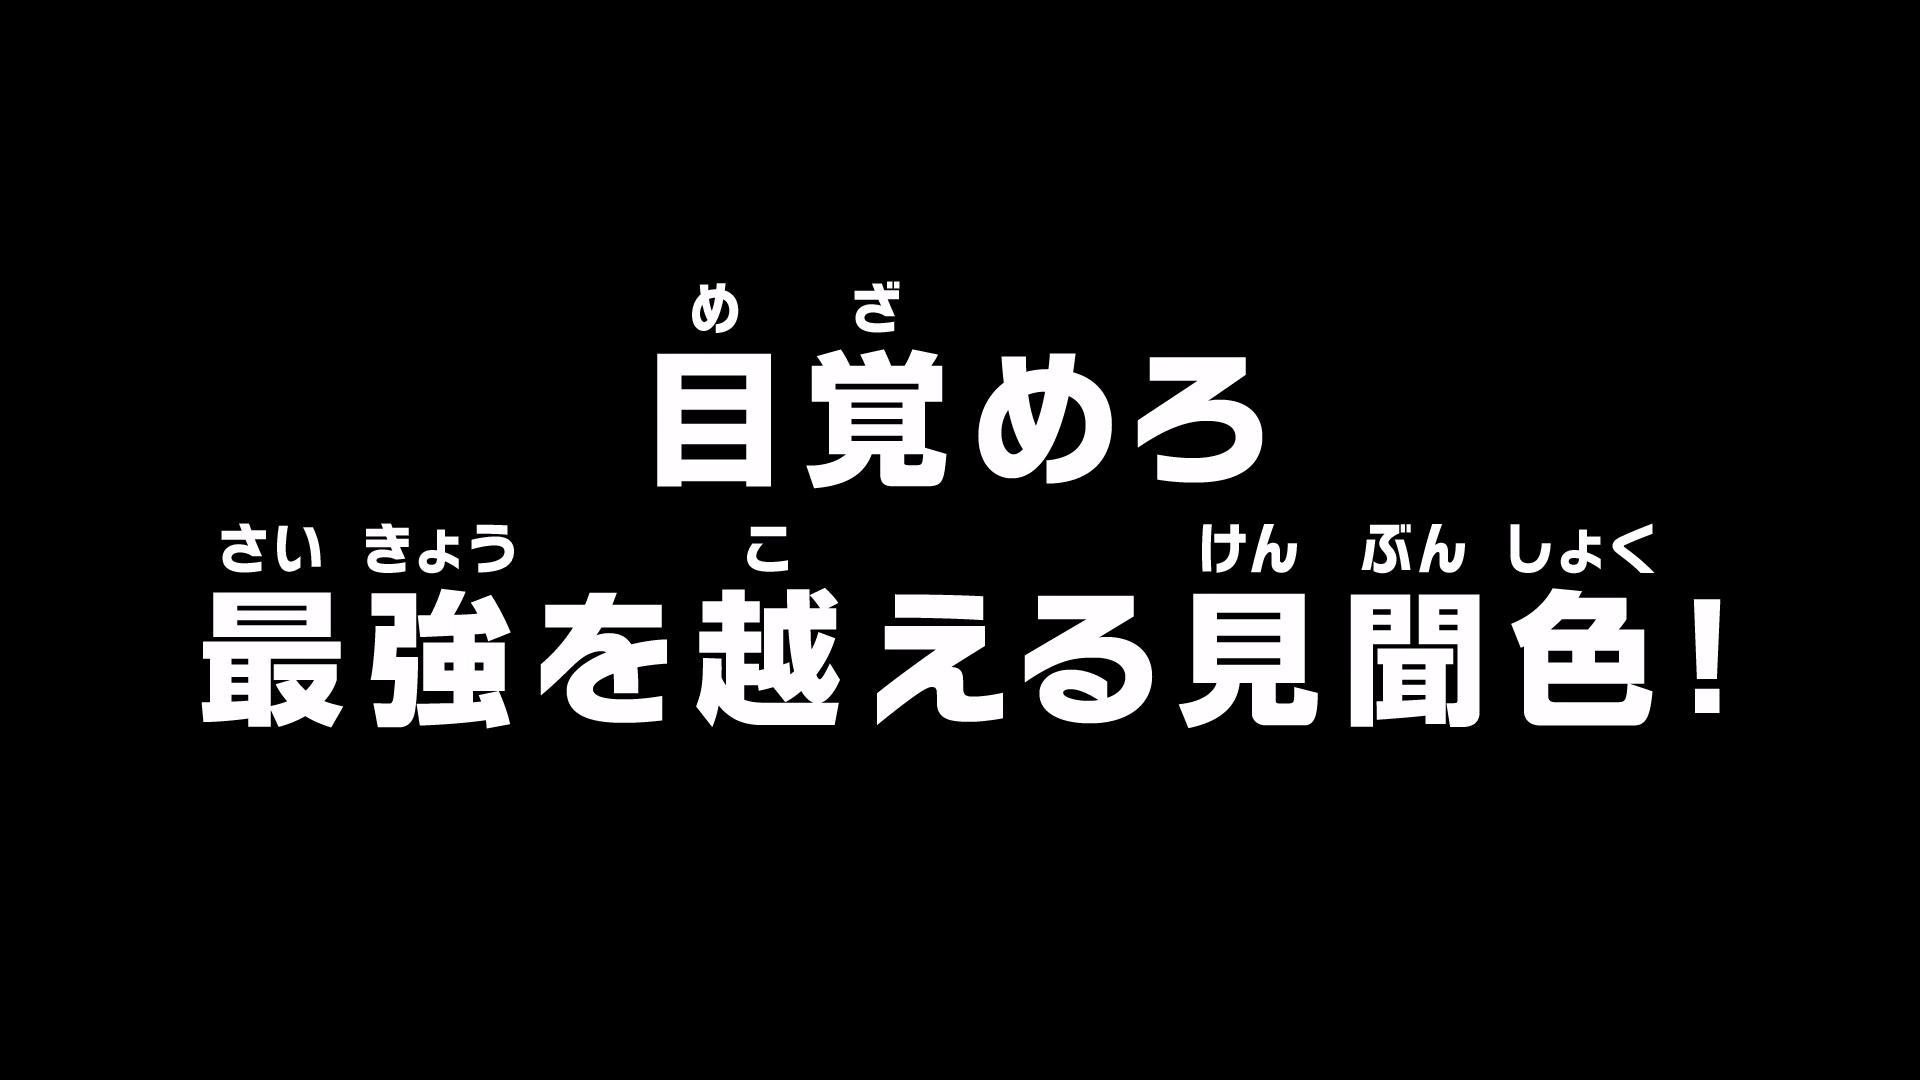 Episode 869